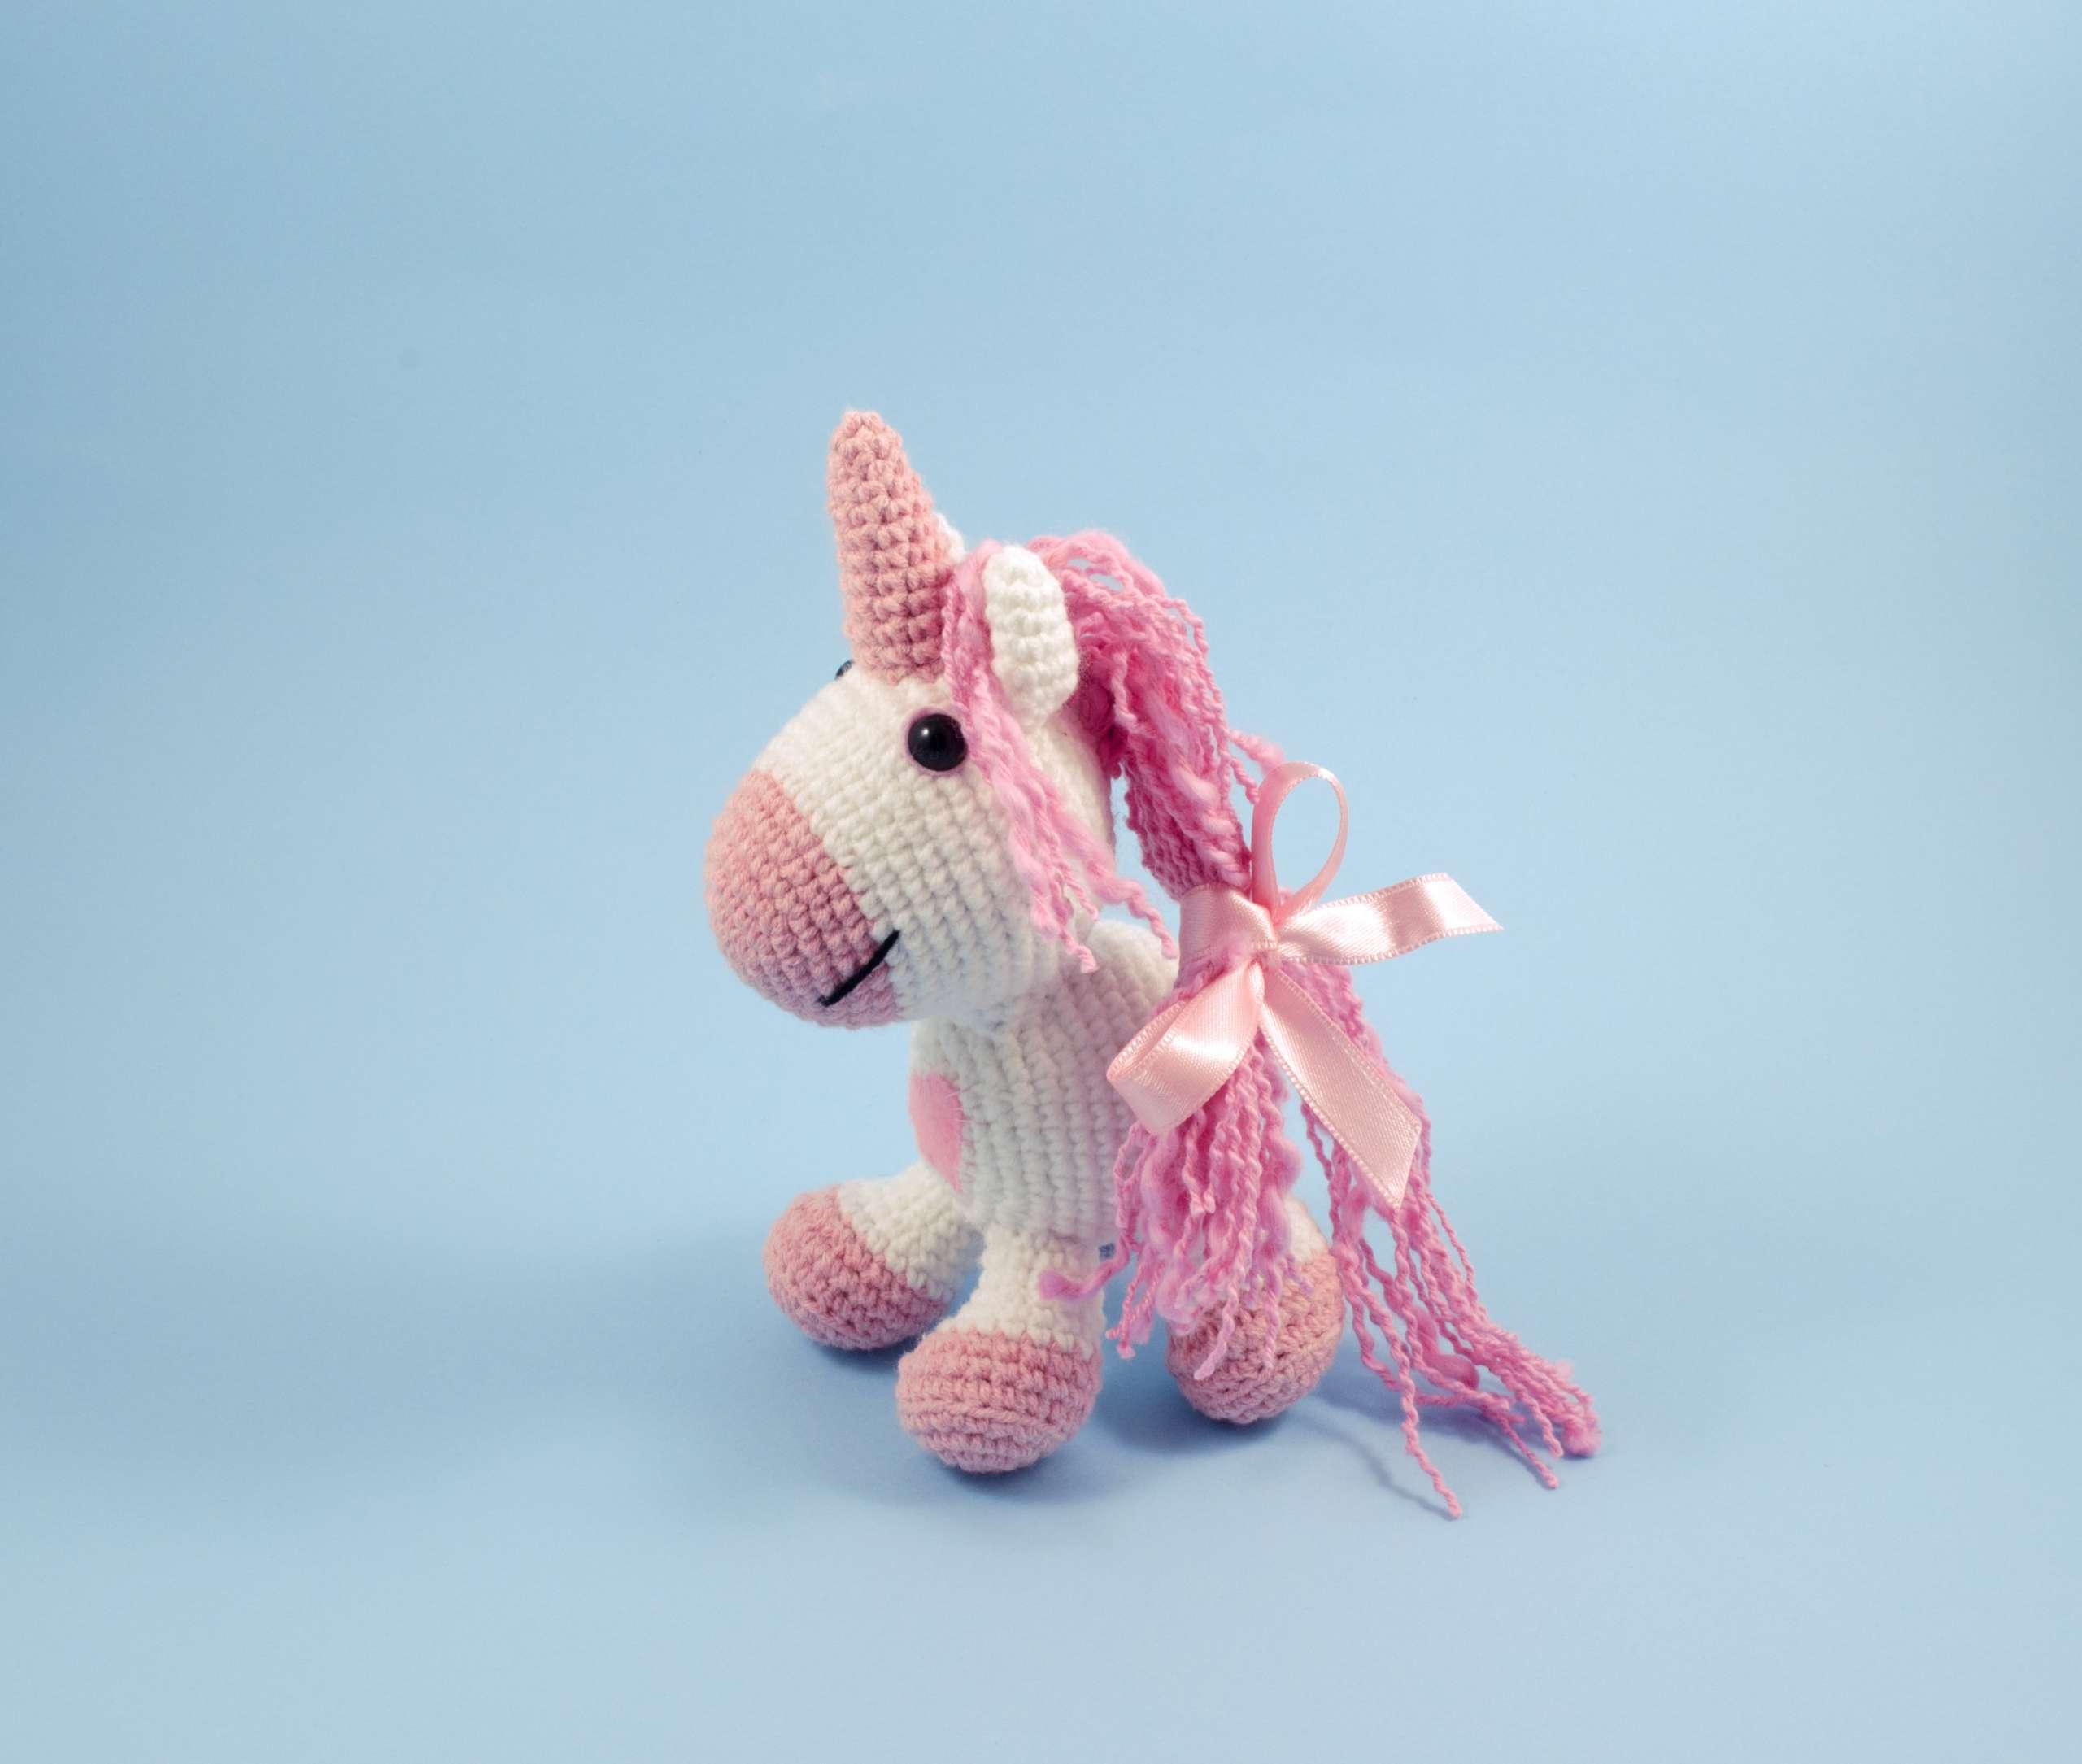 amigurumi pink unicorn side view